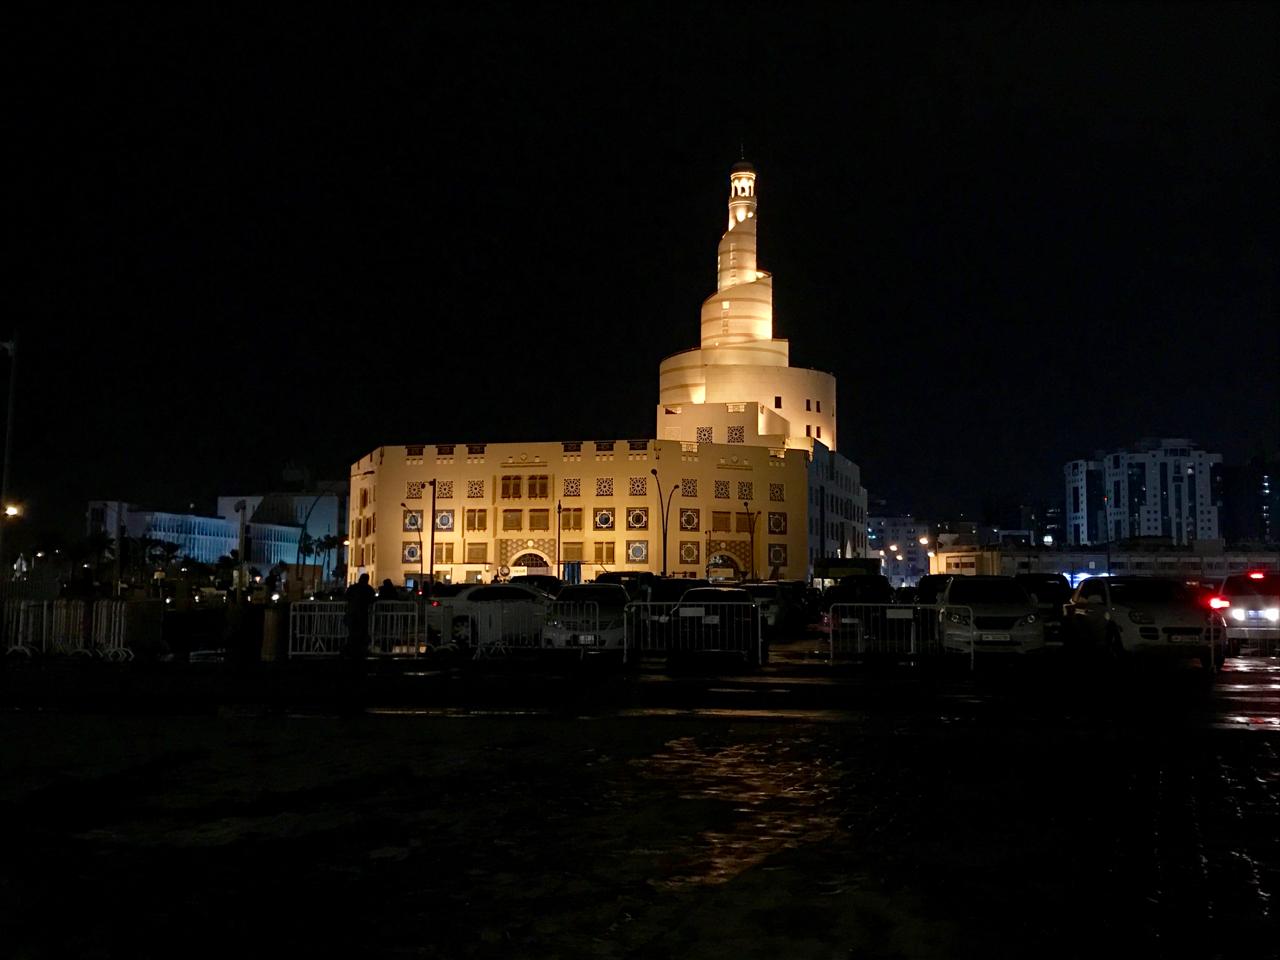 Qatar Islamic Center Doha | Qatar Airways Doha city tour